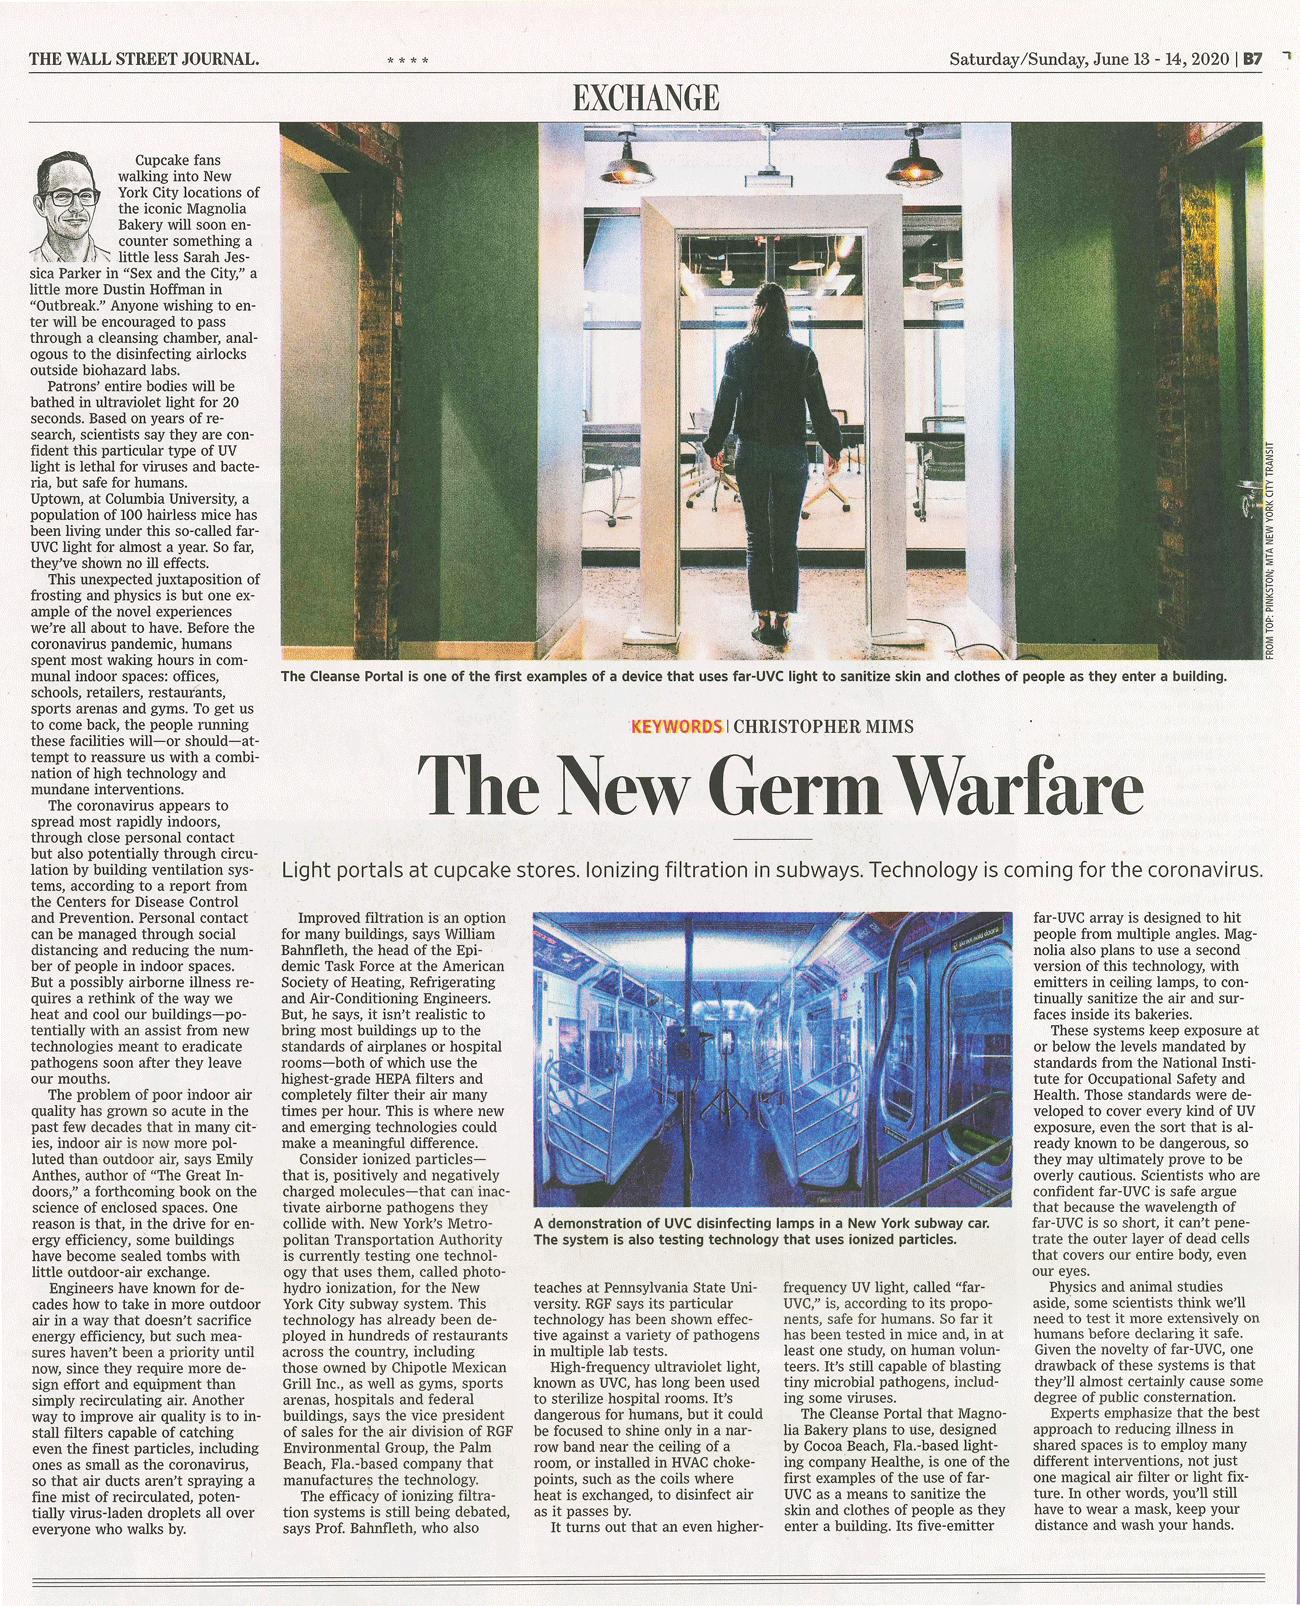 The Wall Street Journal, June 2020 - The New Germ Warfare